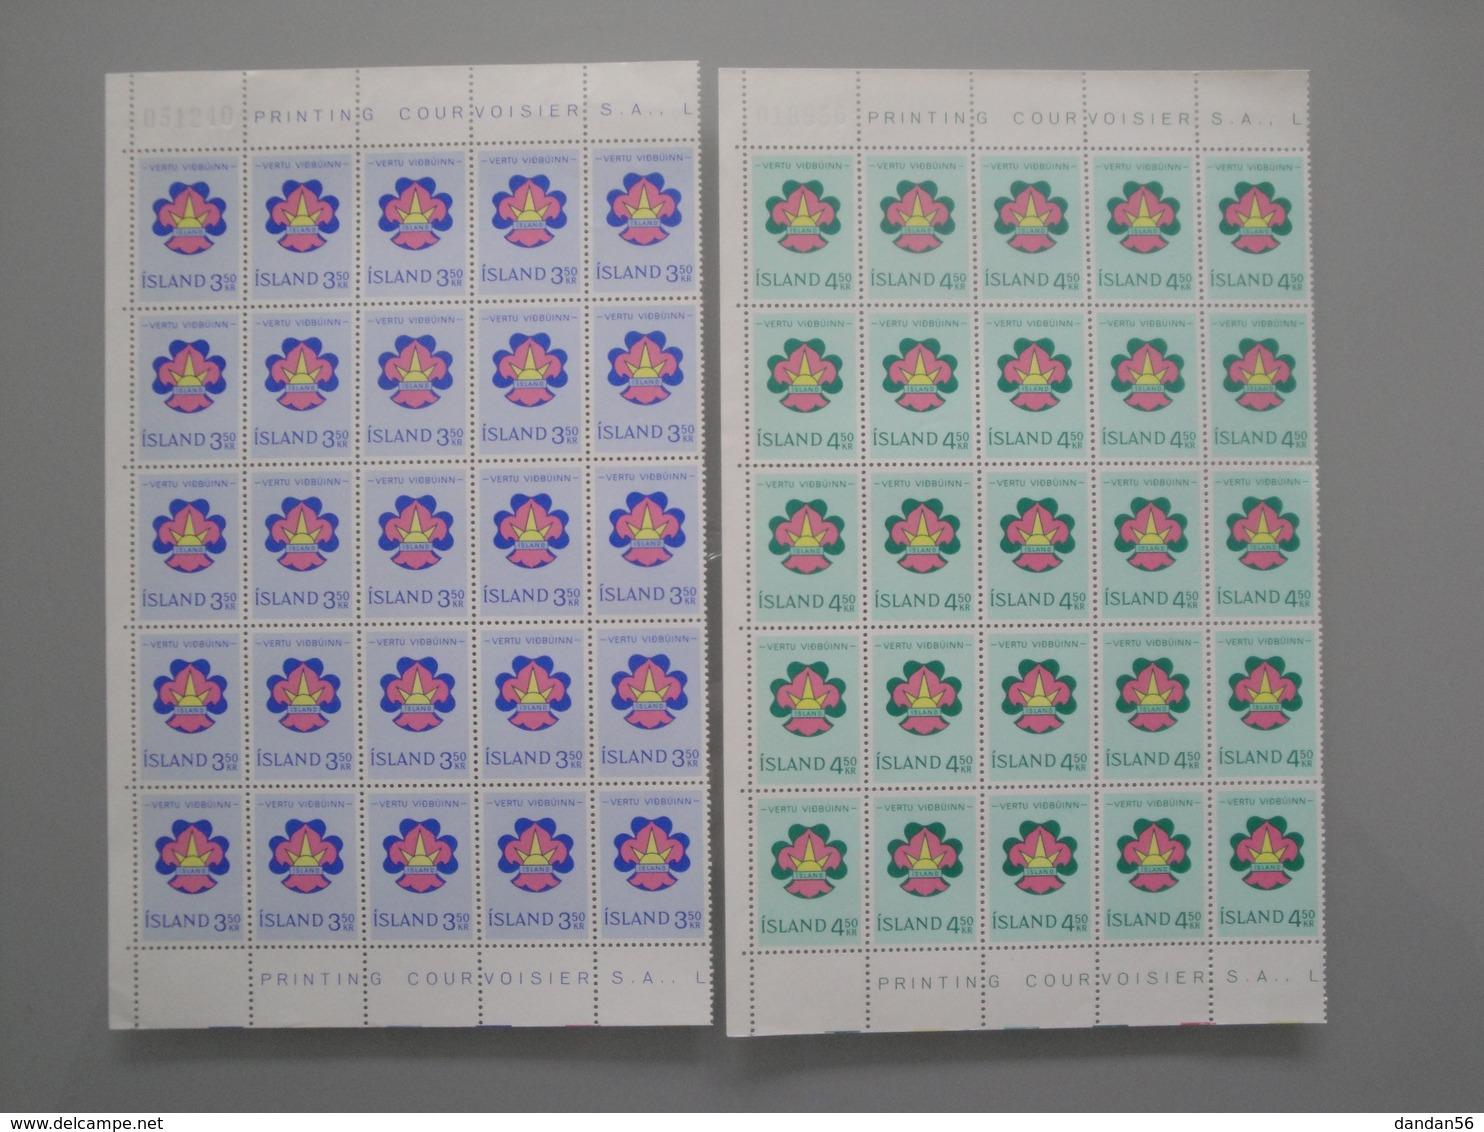 1964 Islande  Yv   333/4 X 25 **  Scout   Scott 360/1  Michel 378/9  Facit 415/6 - Collections, Lots & Séries